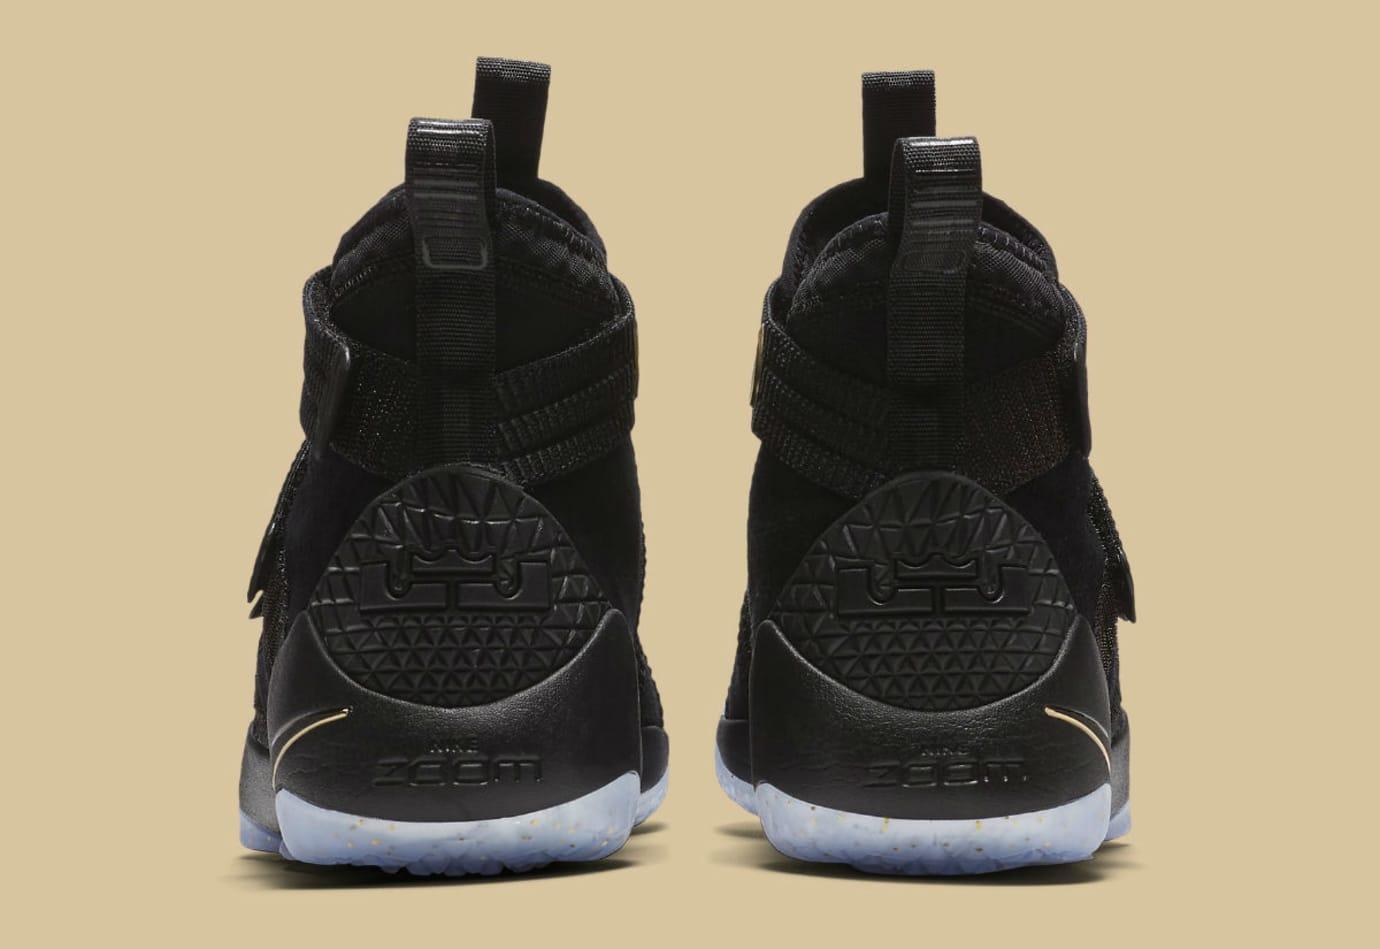 Nike LeBron Soldier 11 SFG Black/Gold Finals Release Date Heel